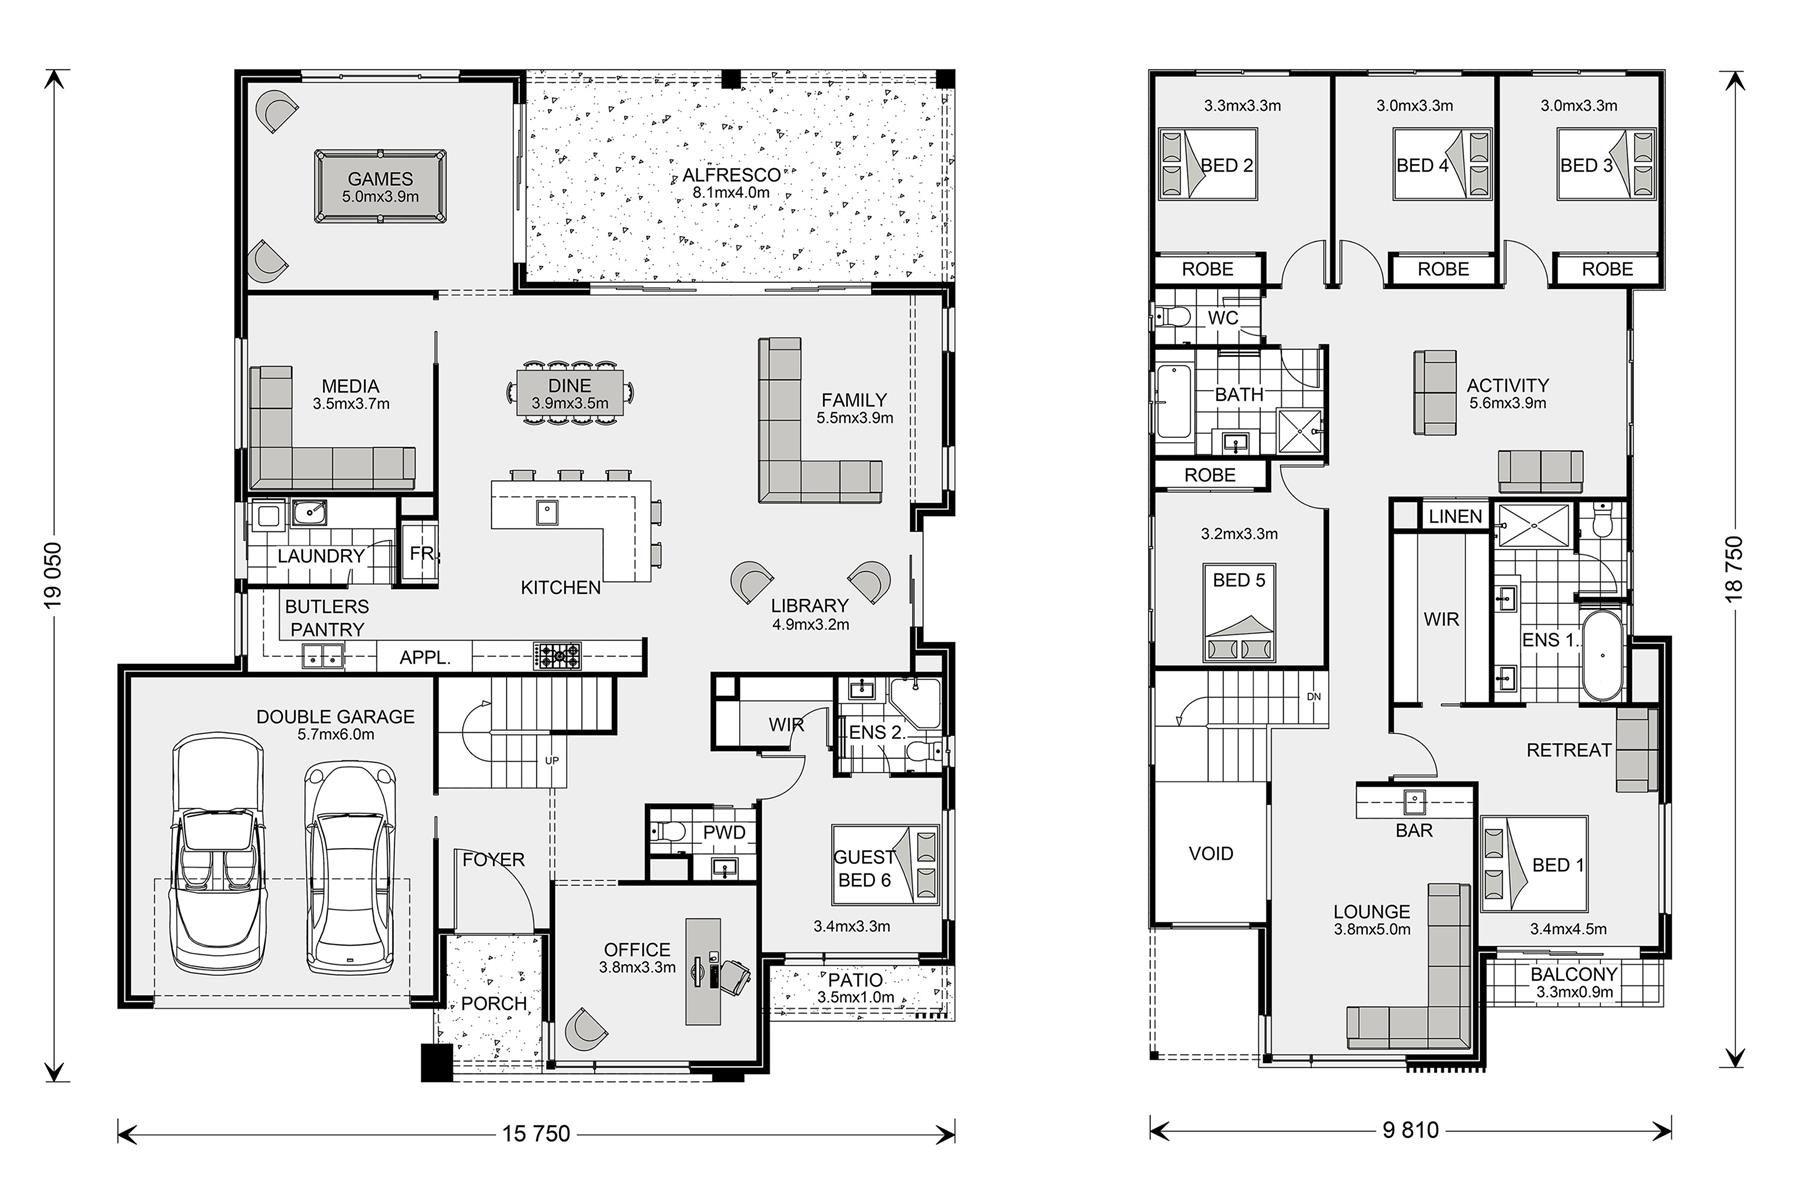 Hawthorn Home Designs In Gympie G J Gardner Homes New House Plans House Design Dream House Plans